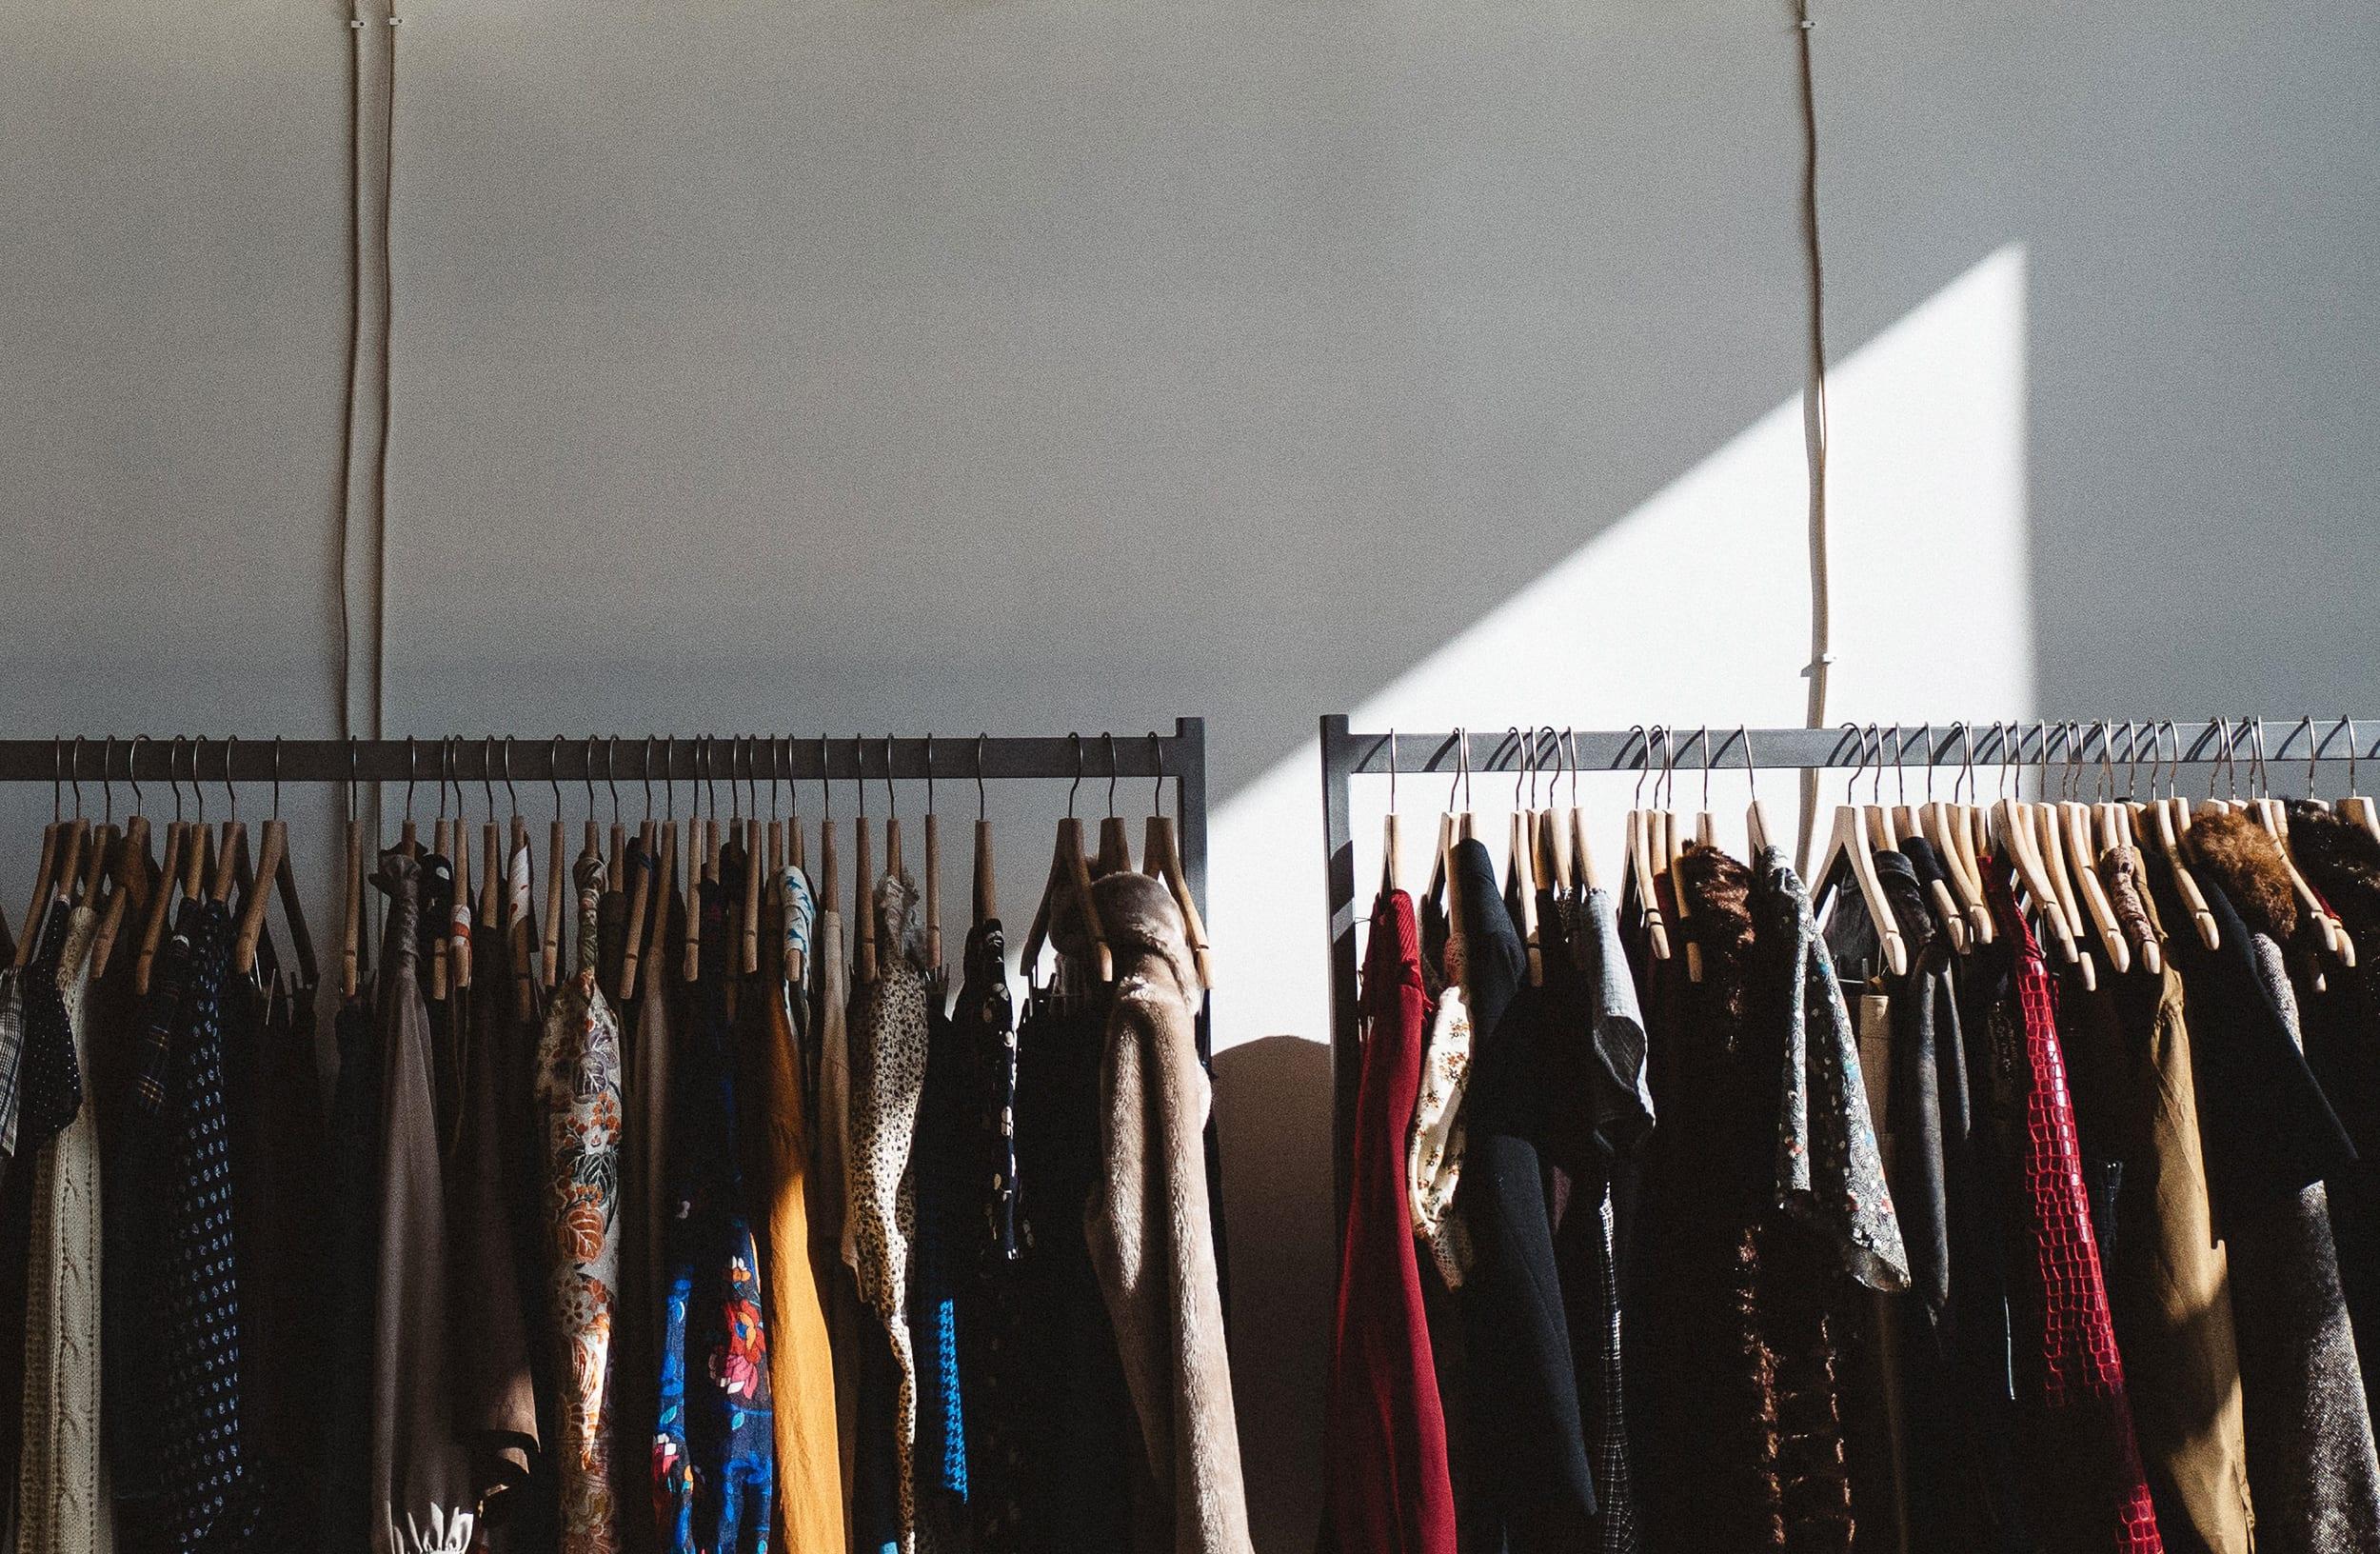 4d98dd3d29e The Best Travel Clothing Brands for Women